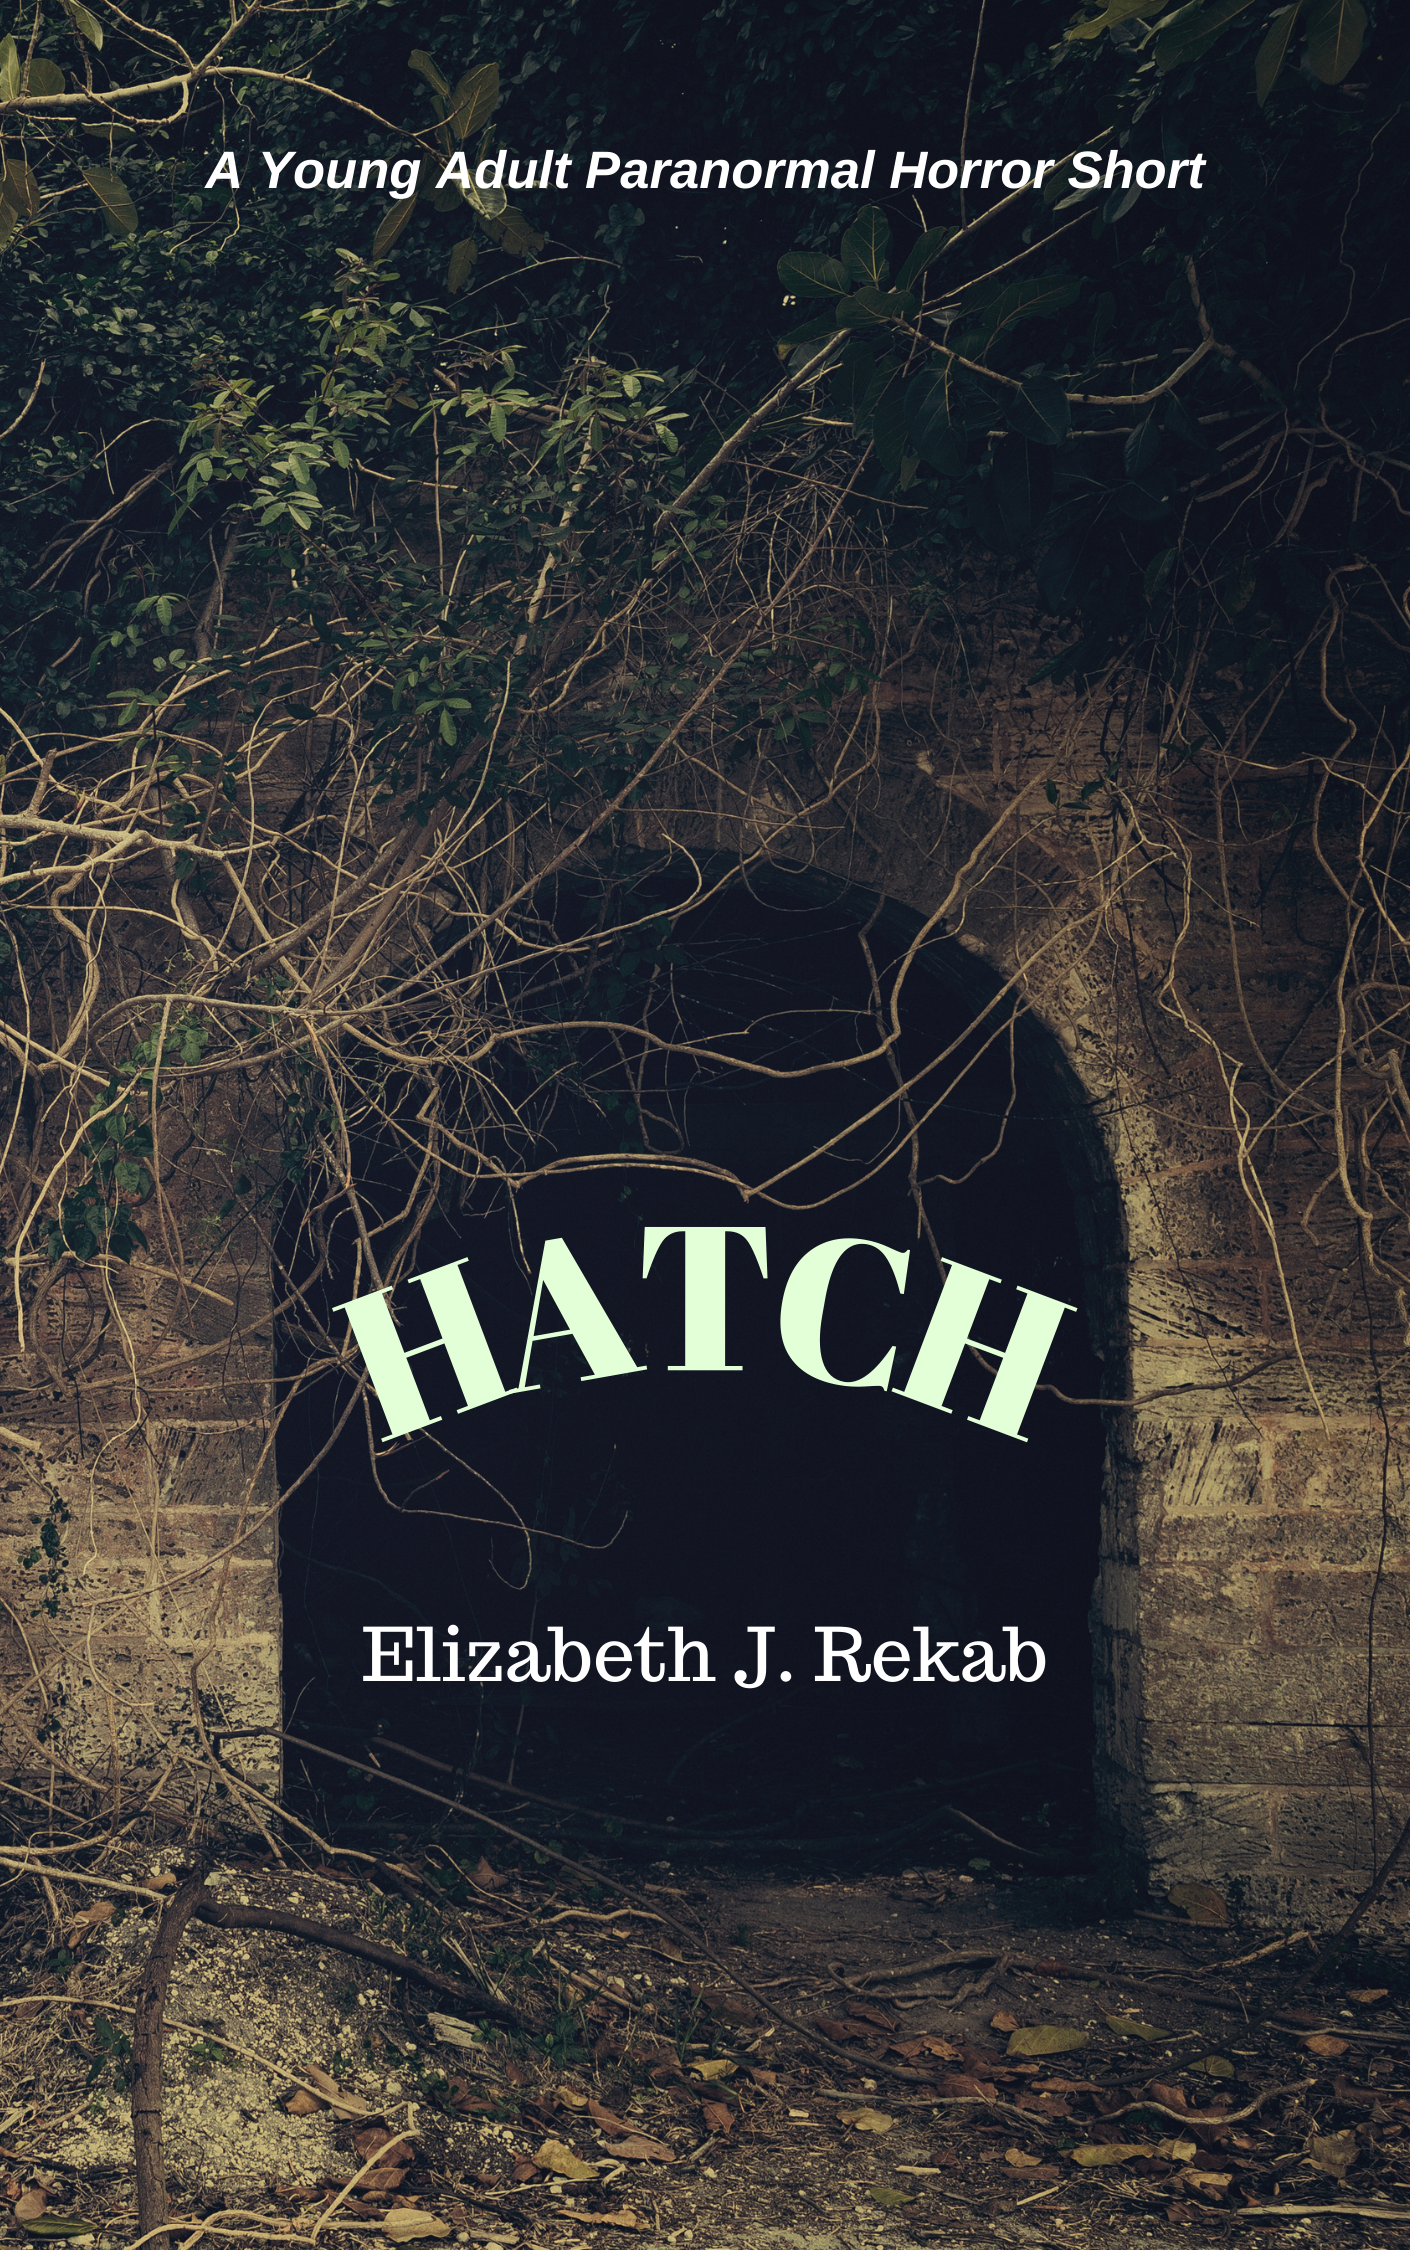 HATCH-3.png